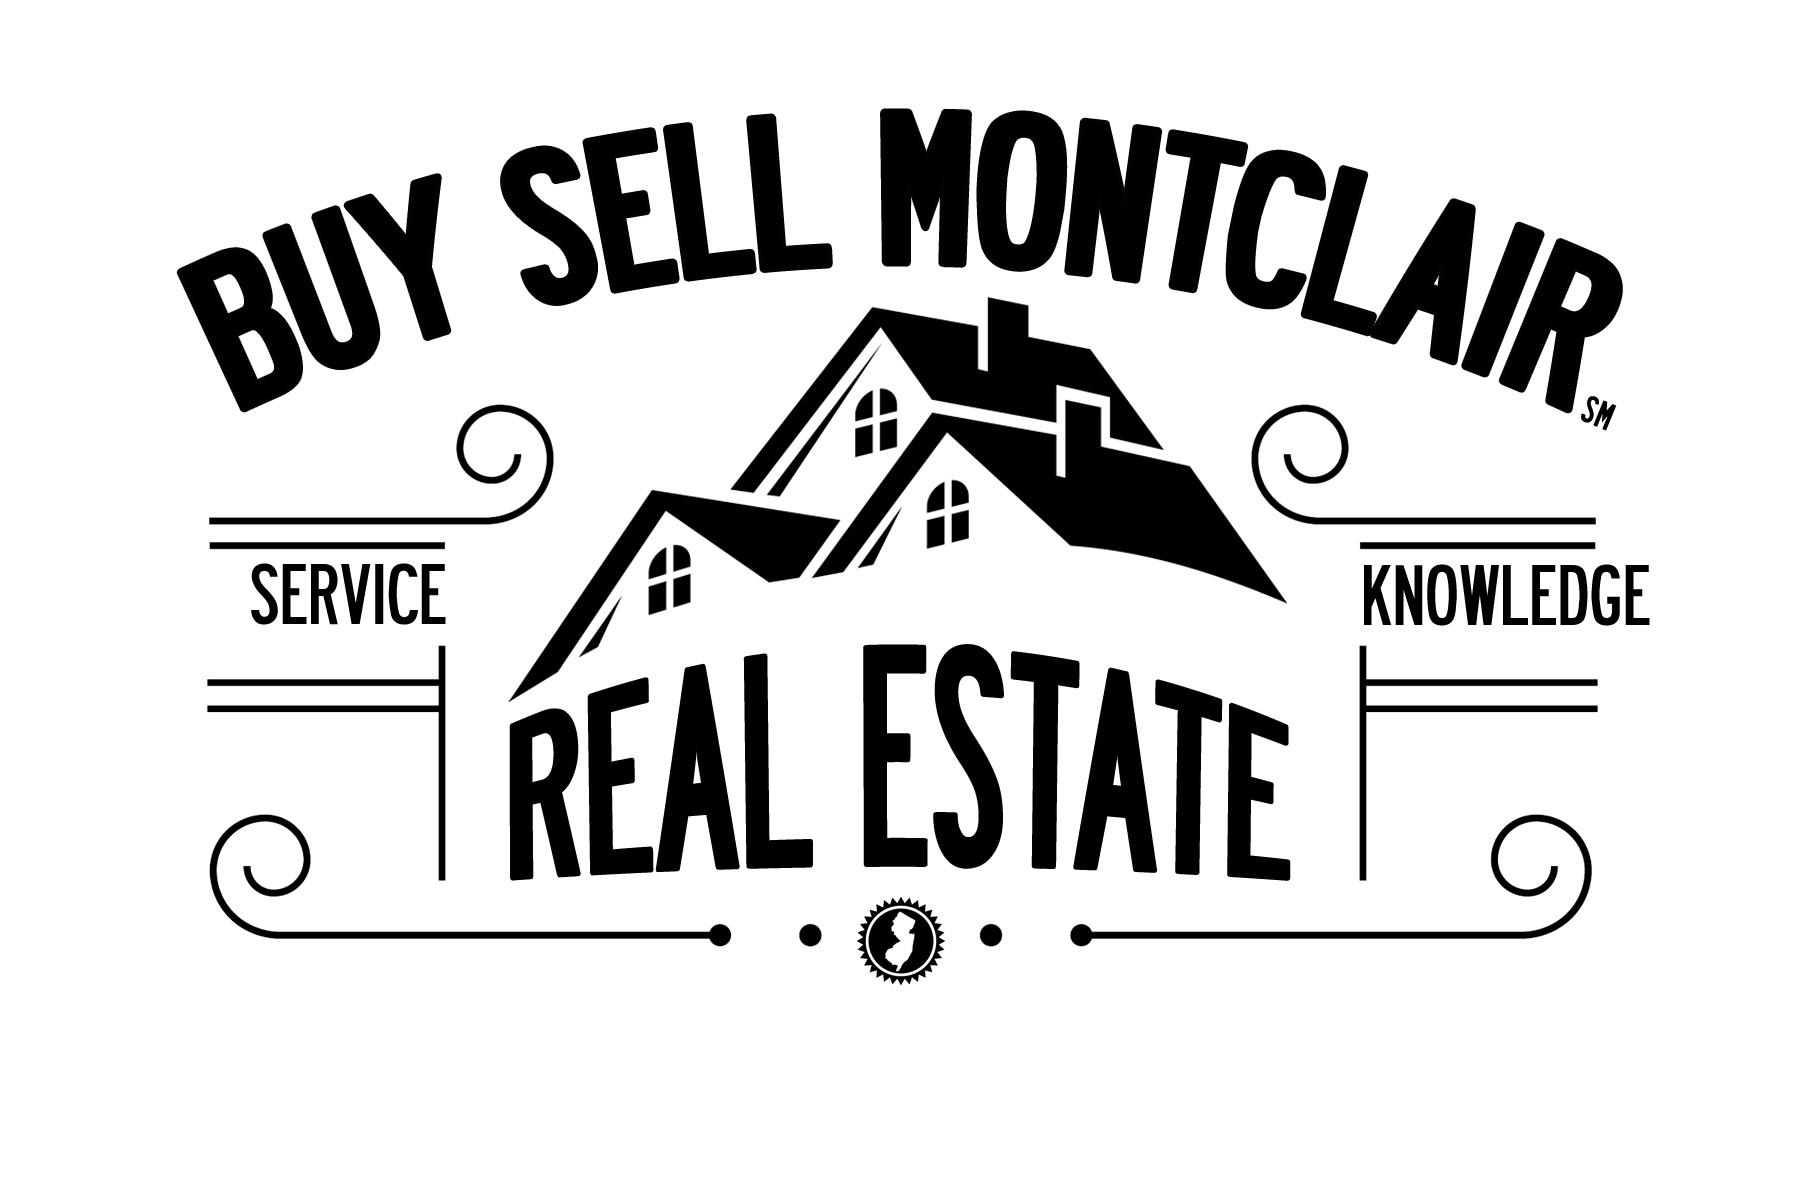 BuySellMontclair logo .jpg